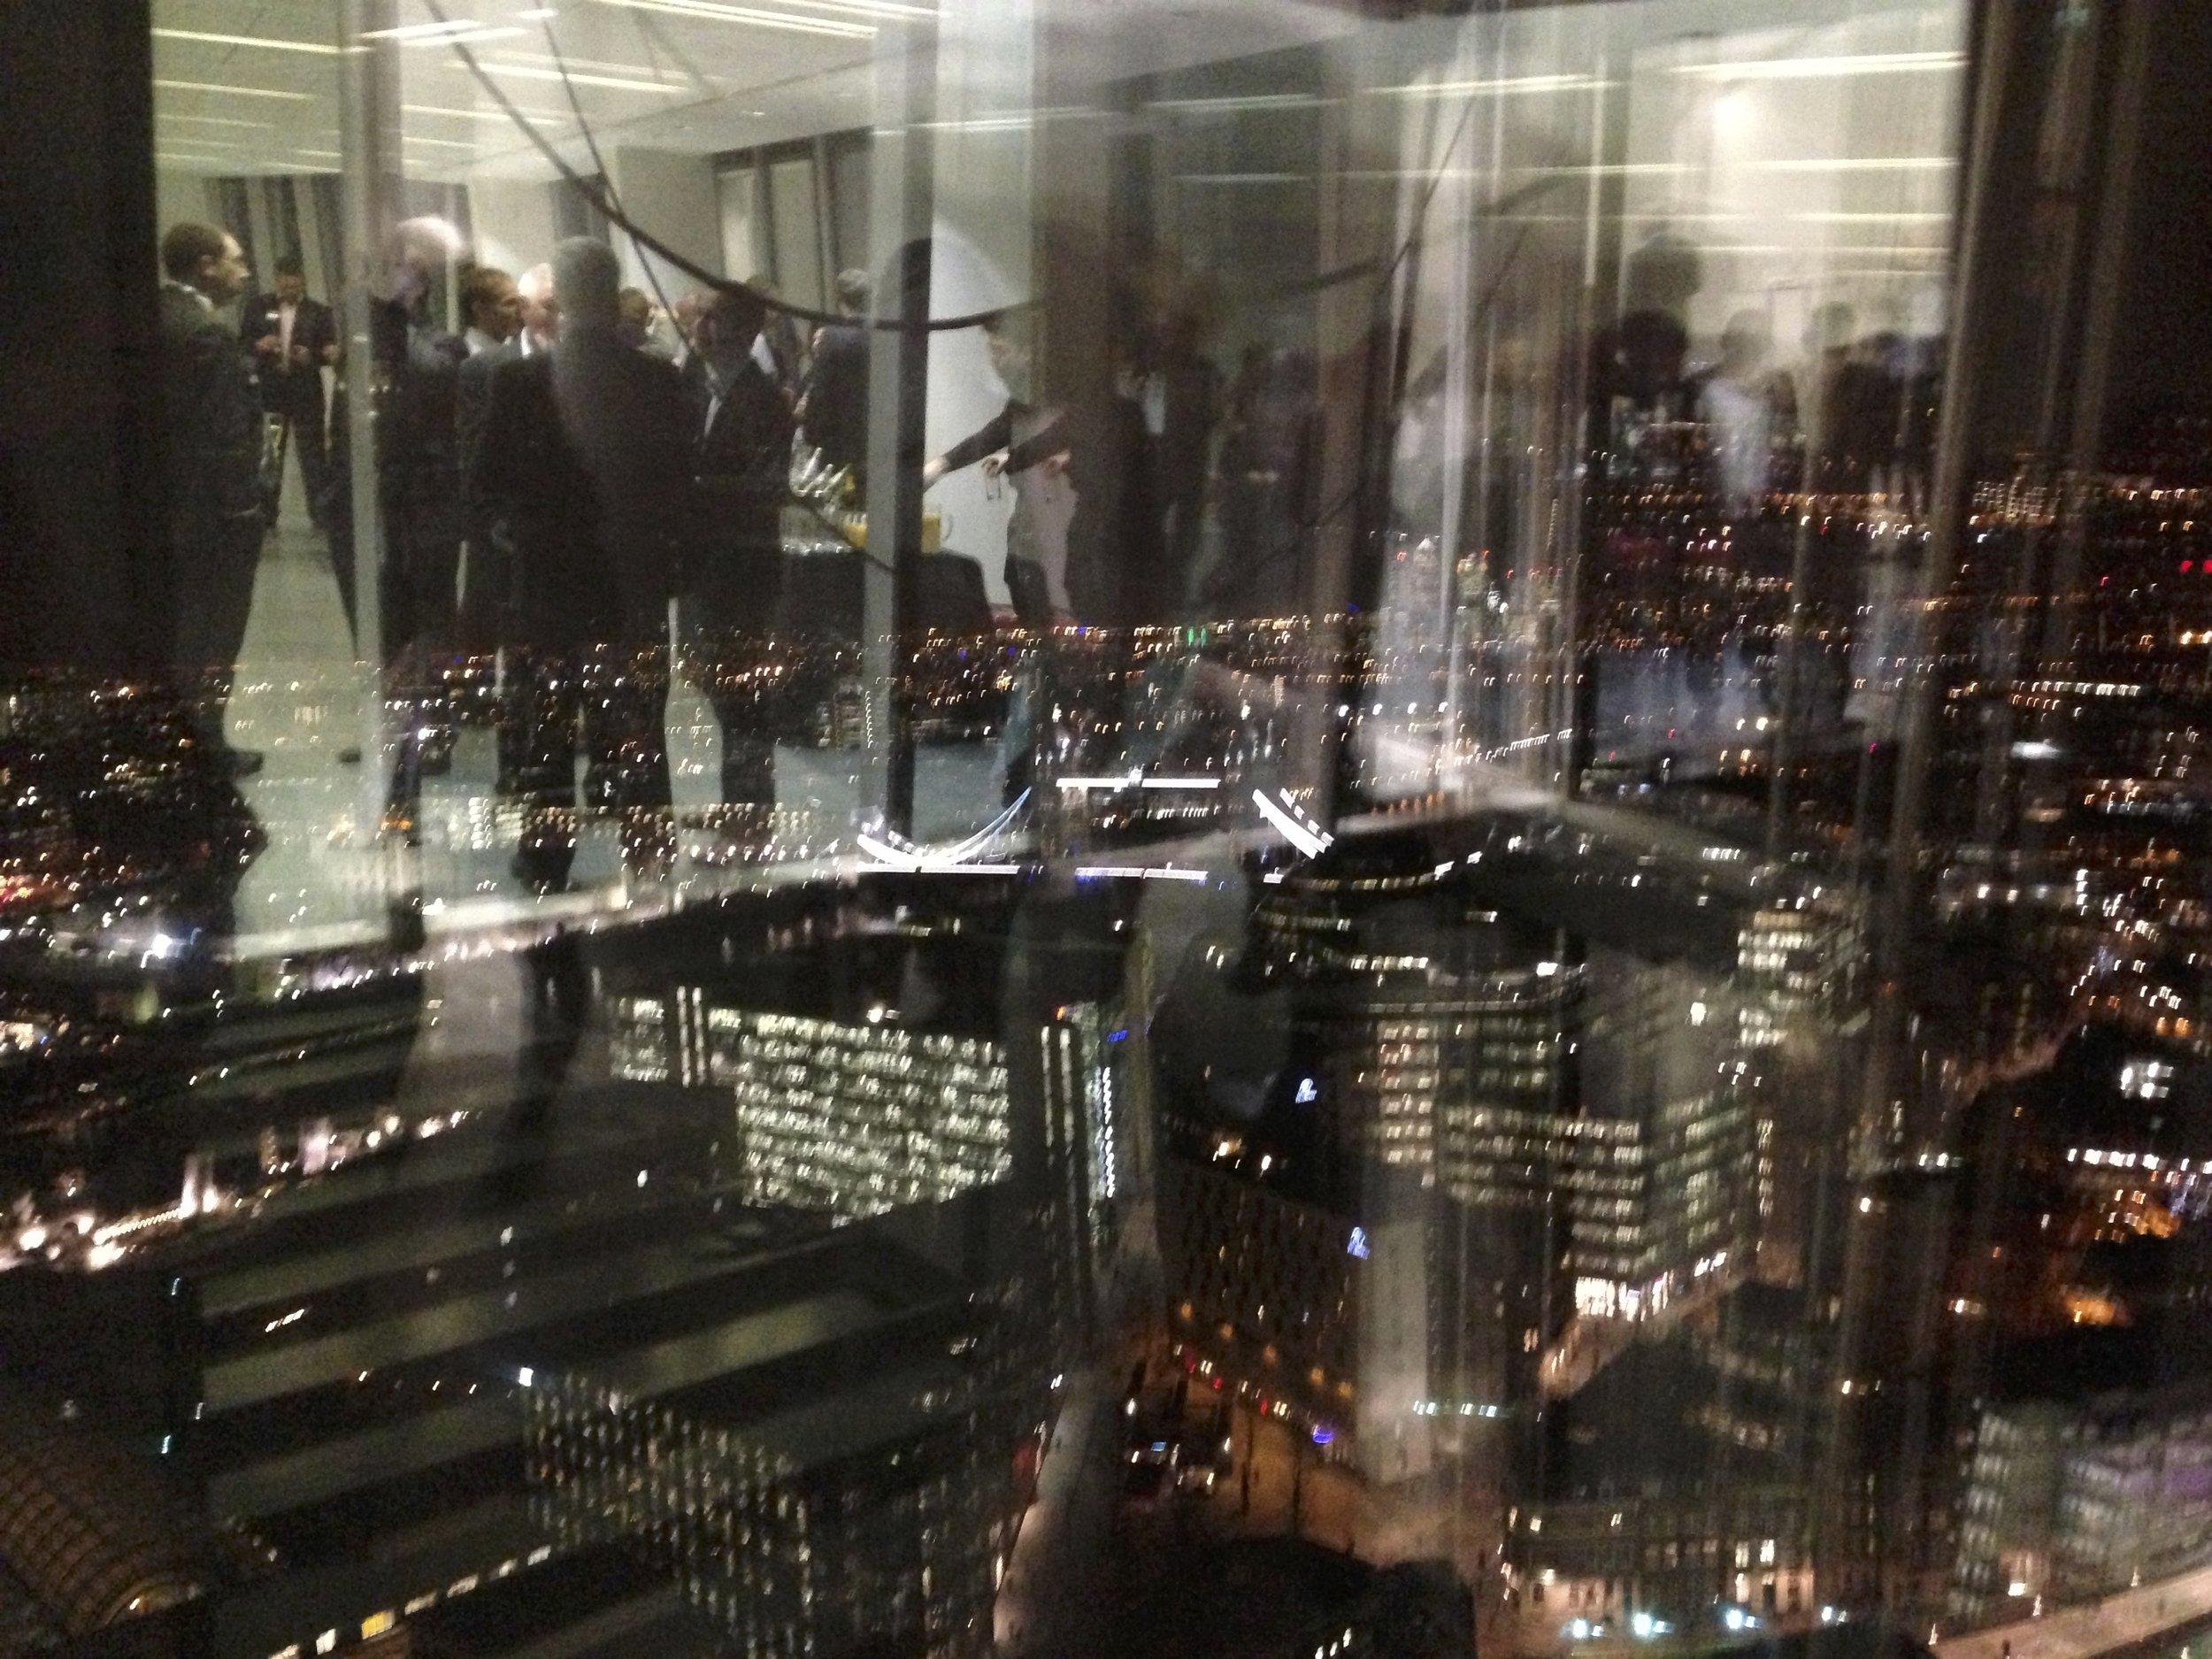 night city - 1.jpg